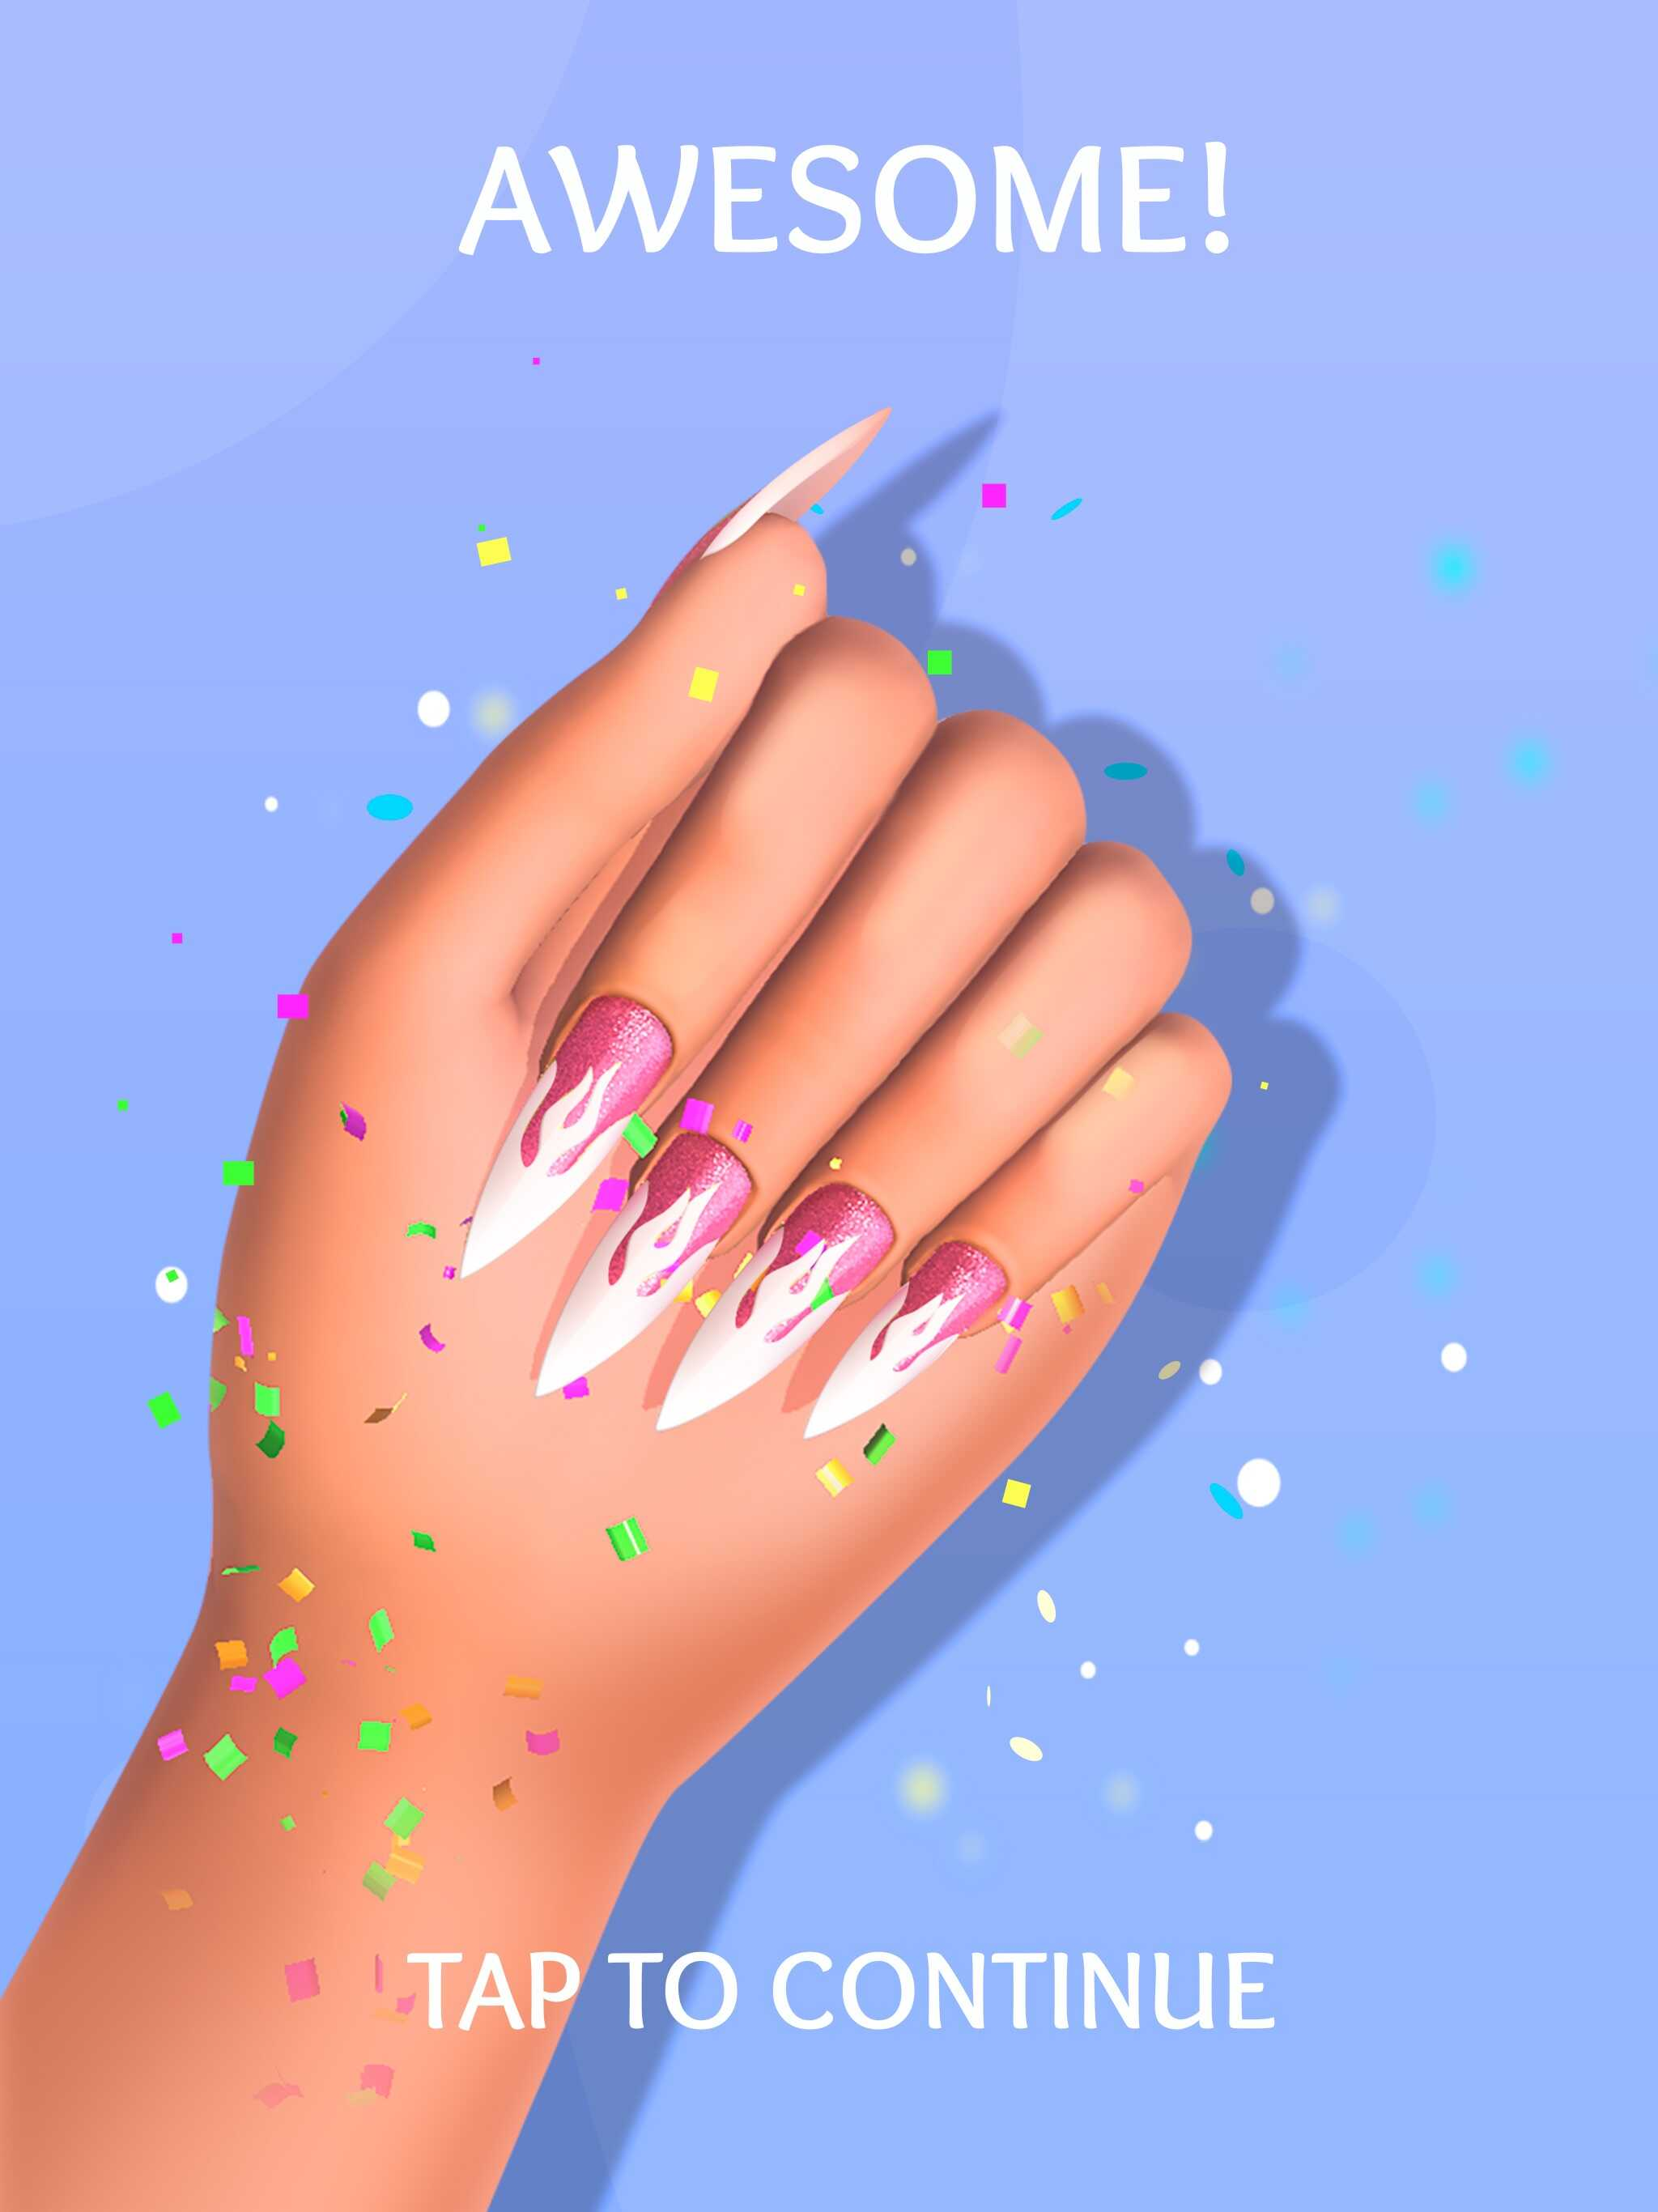 Acrylic Nails!(アクリリックネイルズ)を評価&レビュー!ハイパーカジュアルゲームとして何点?